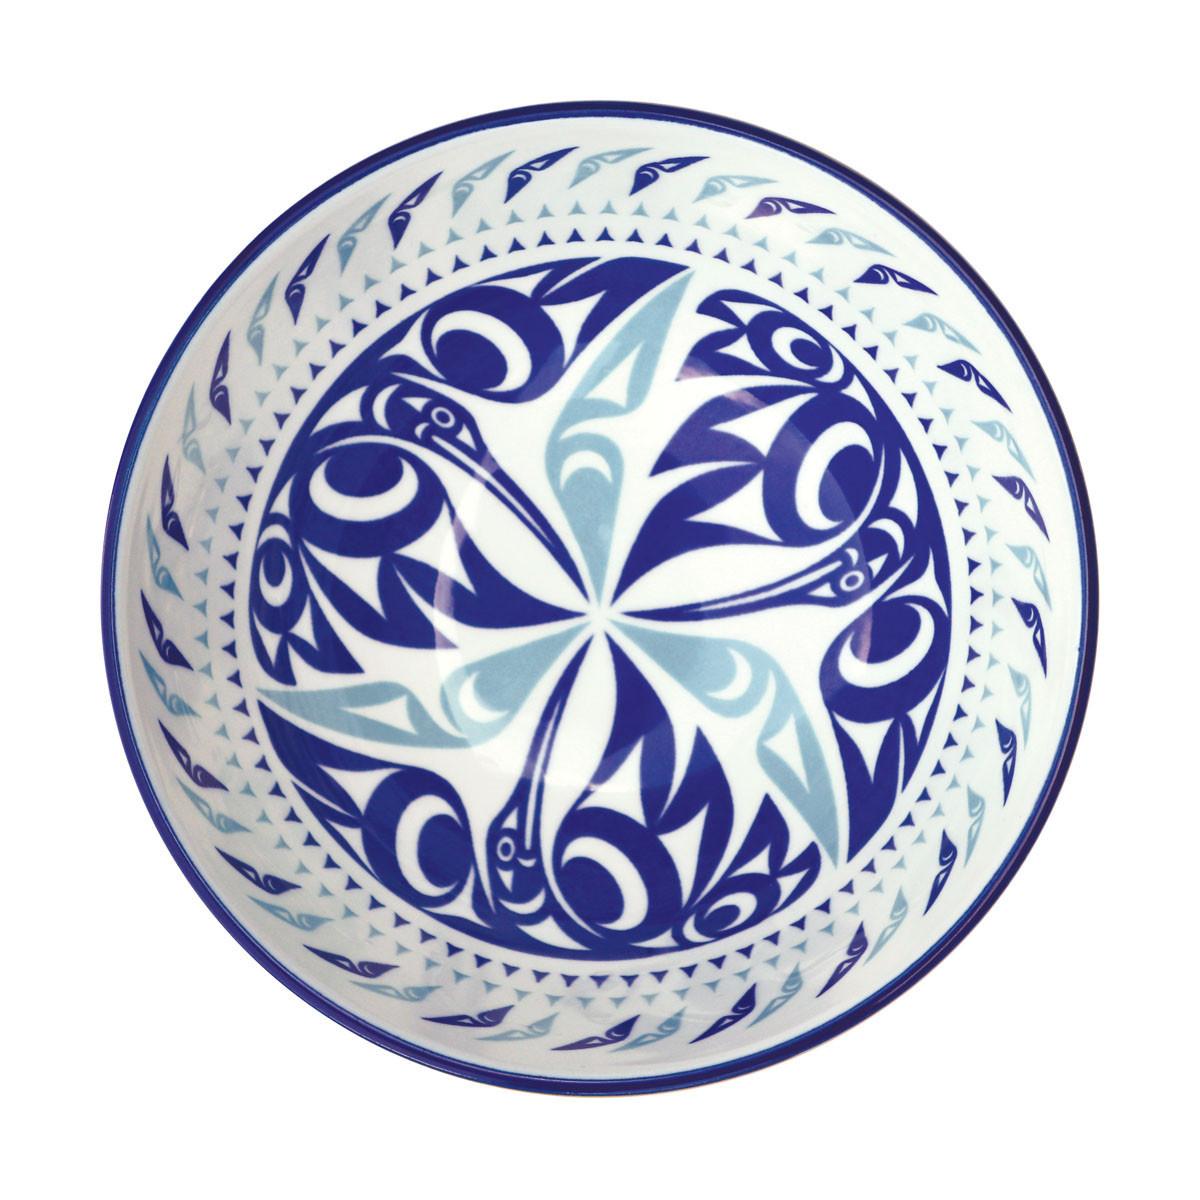 Porcelain Art Bowl - Medium-9